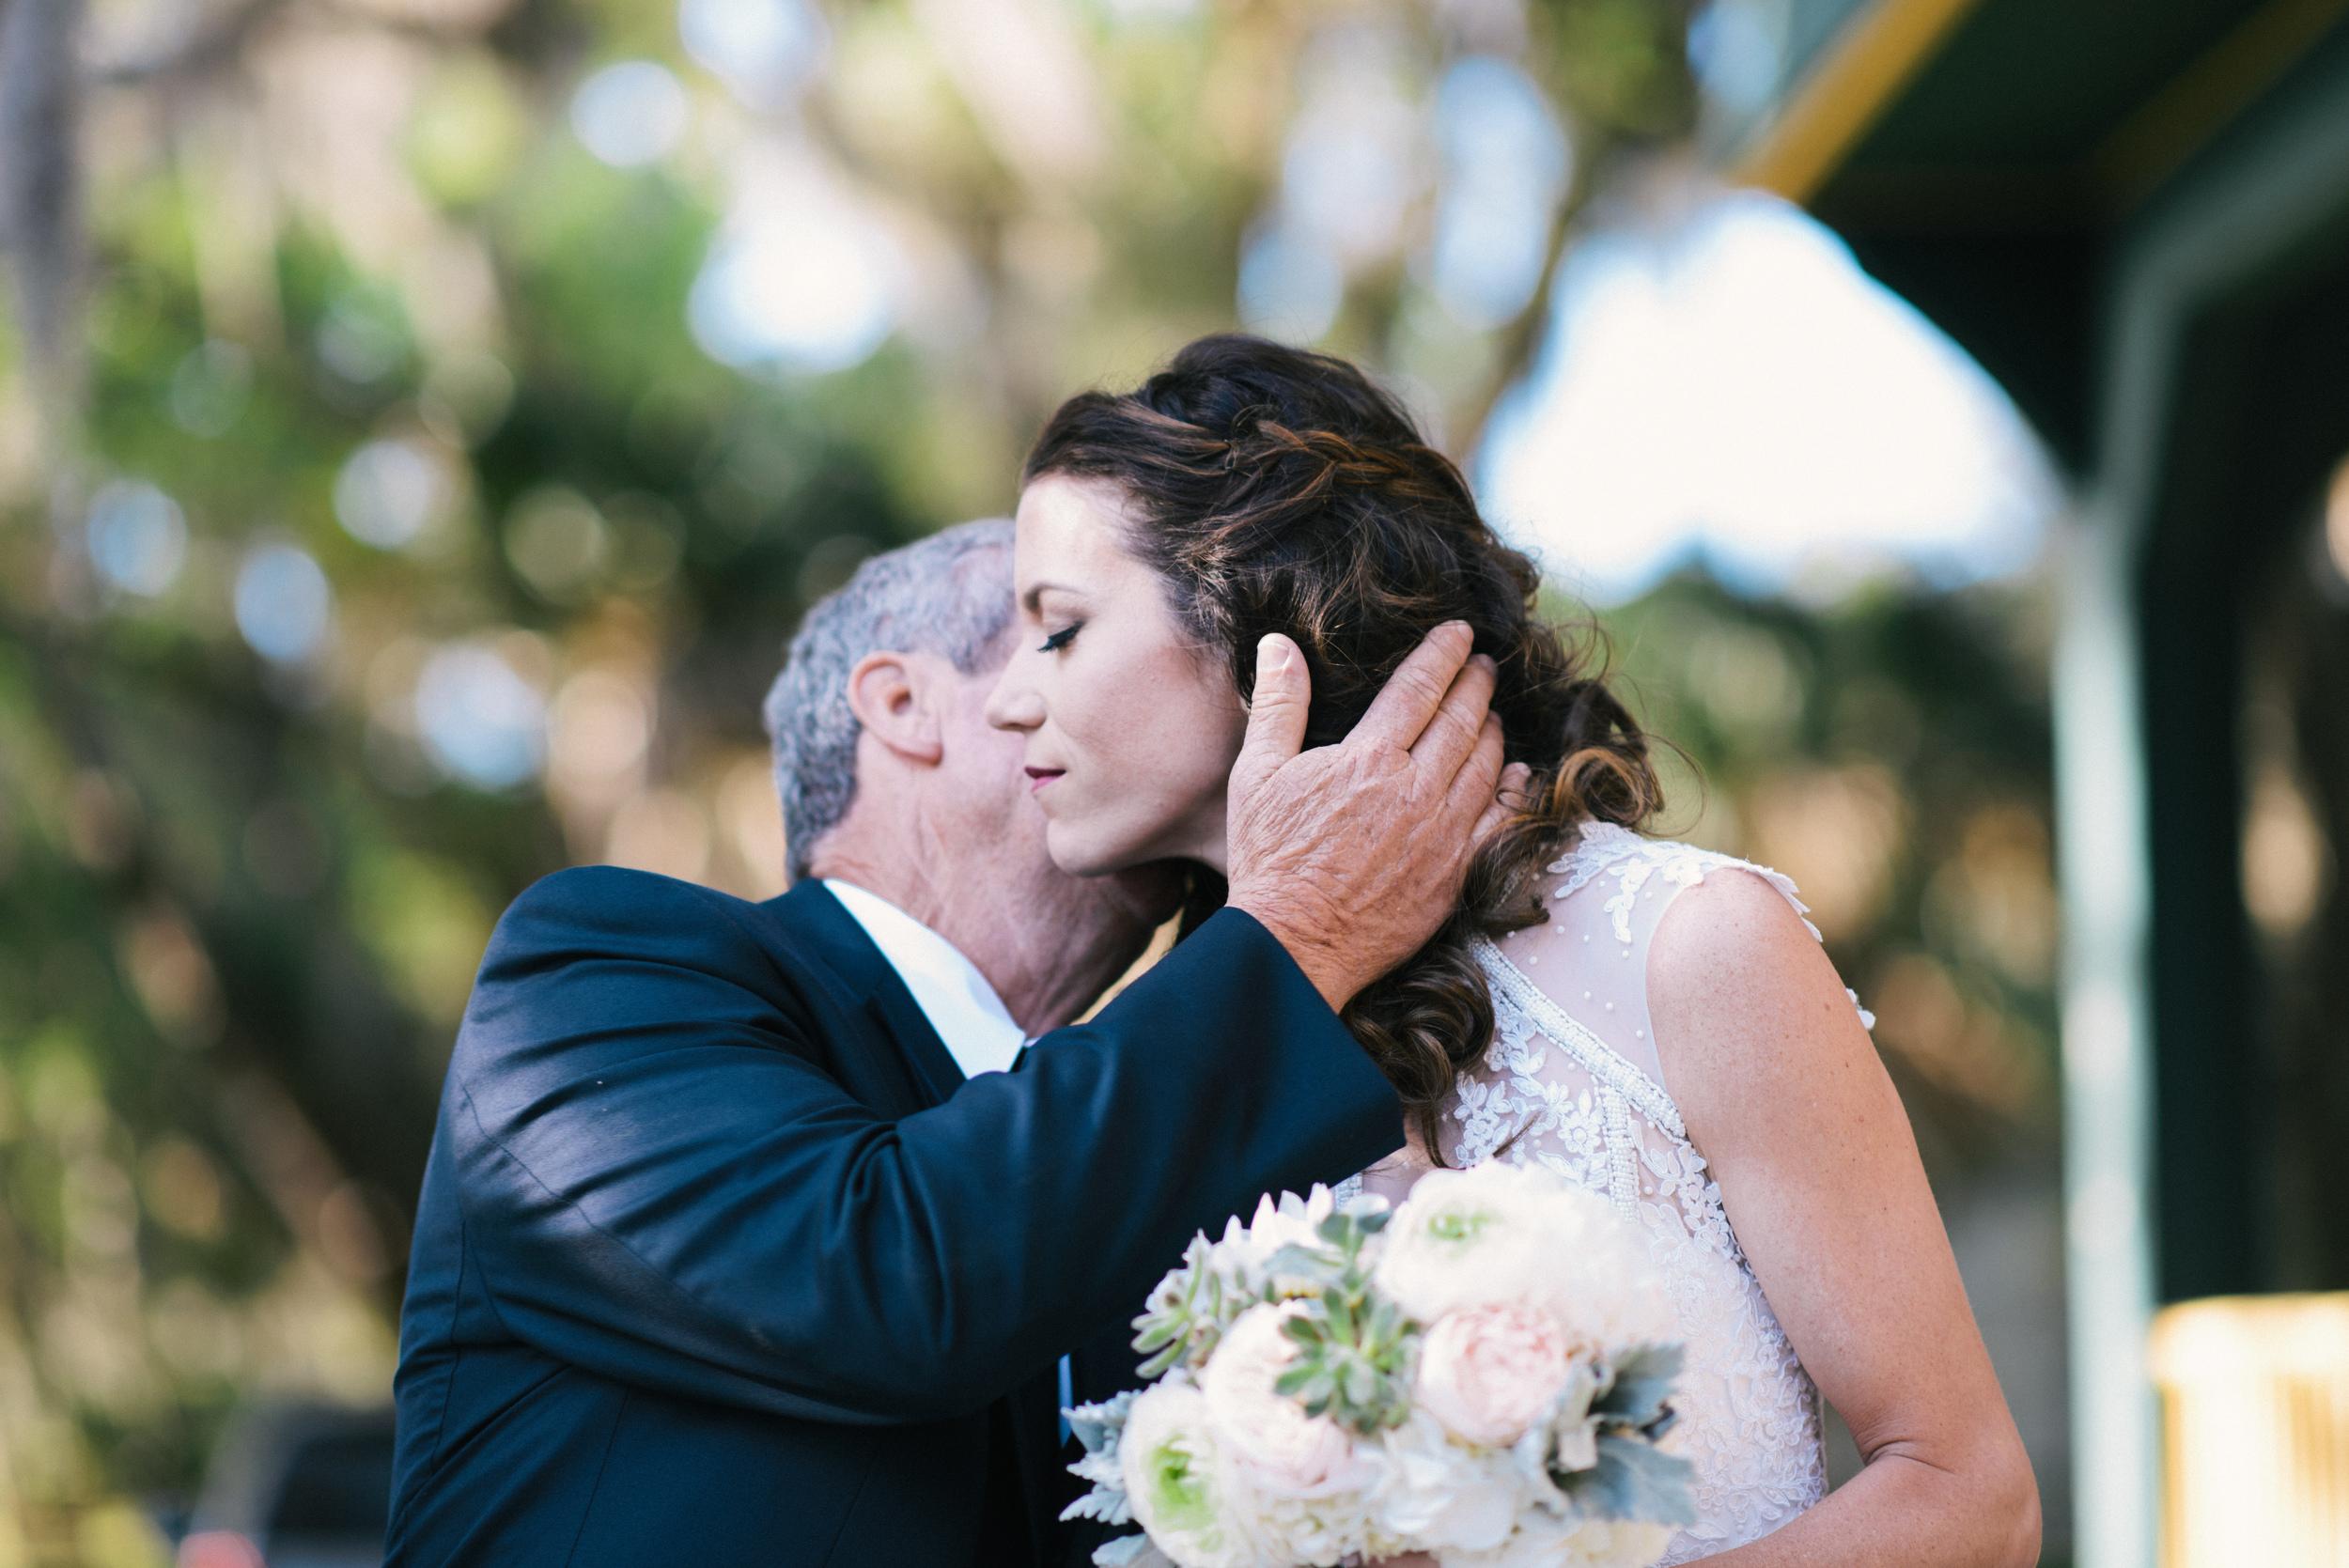 kadi-and-matt-carroll-april-9-2016-jekyl-island-wedding-m-newsom-photography- (445 of 744).jpg